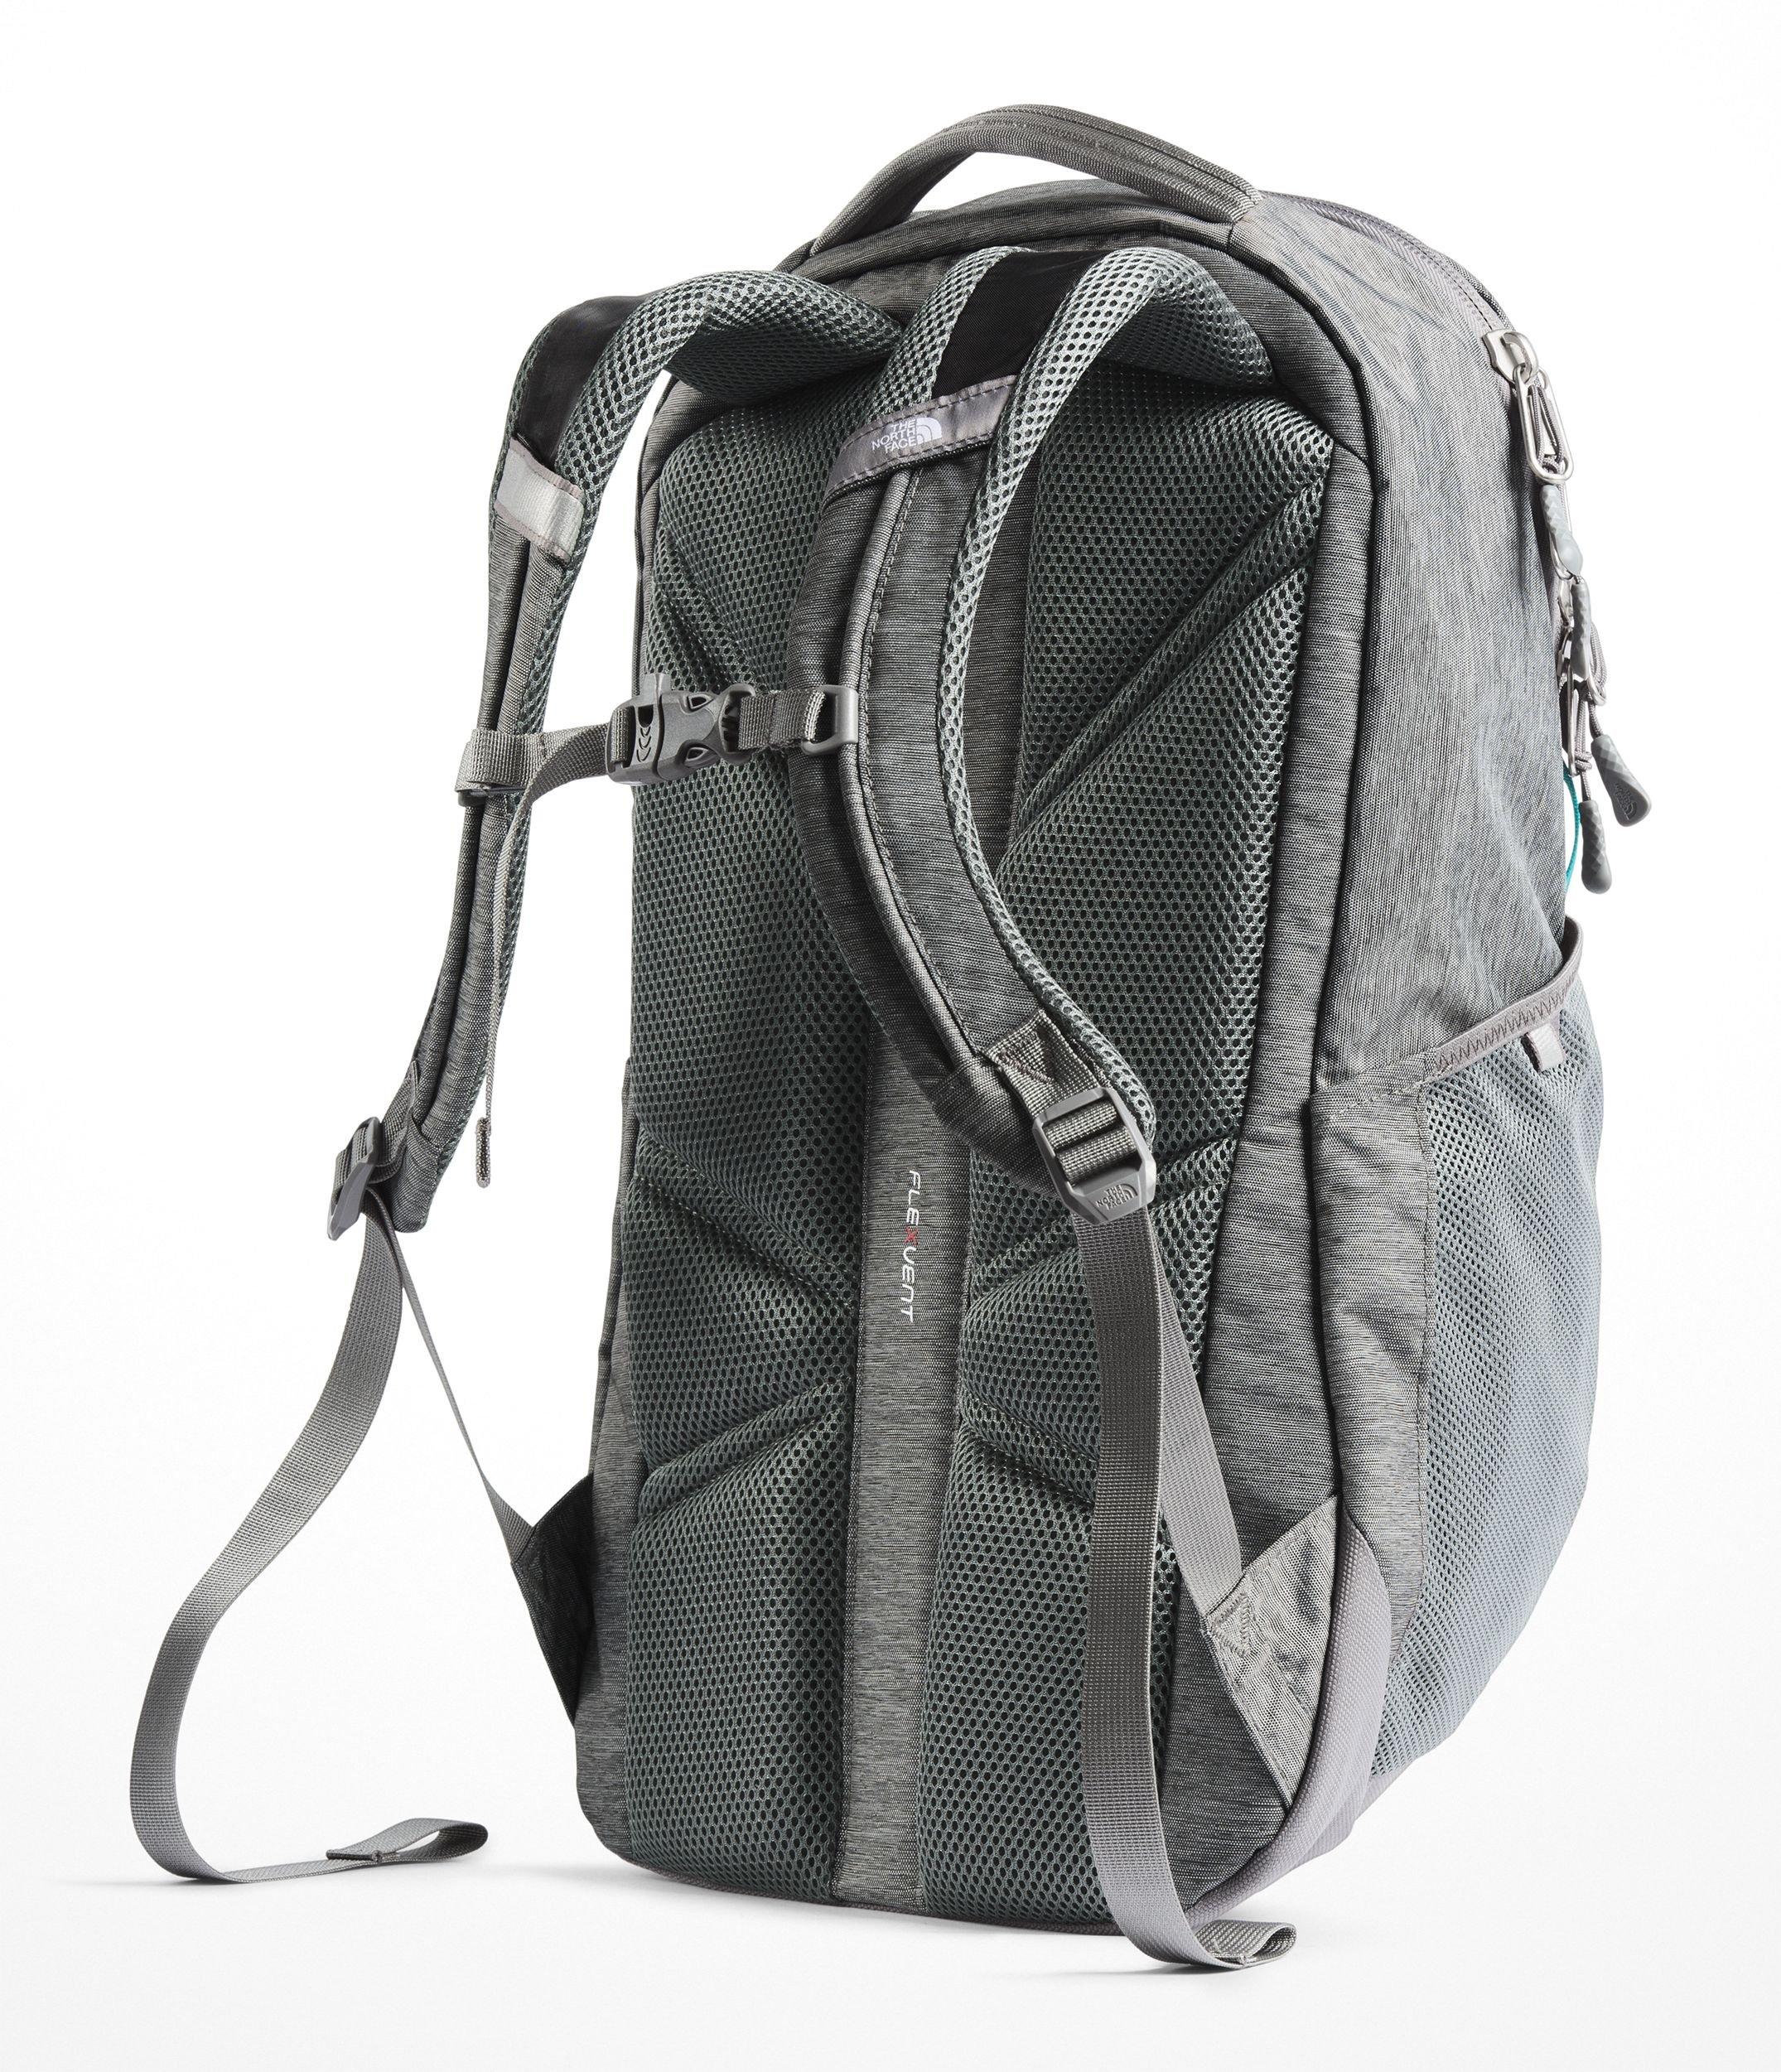 ca3ba6c2b1 The North Face Women's Vault Backpack - Zinc Grey Light Heather & Kokomo  Green - OS